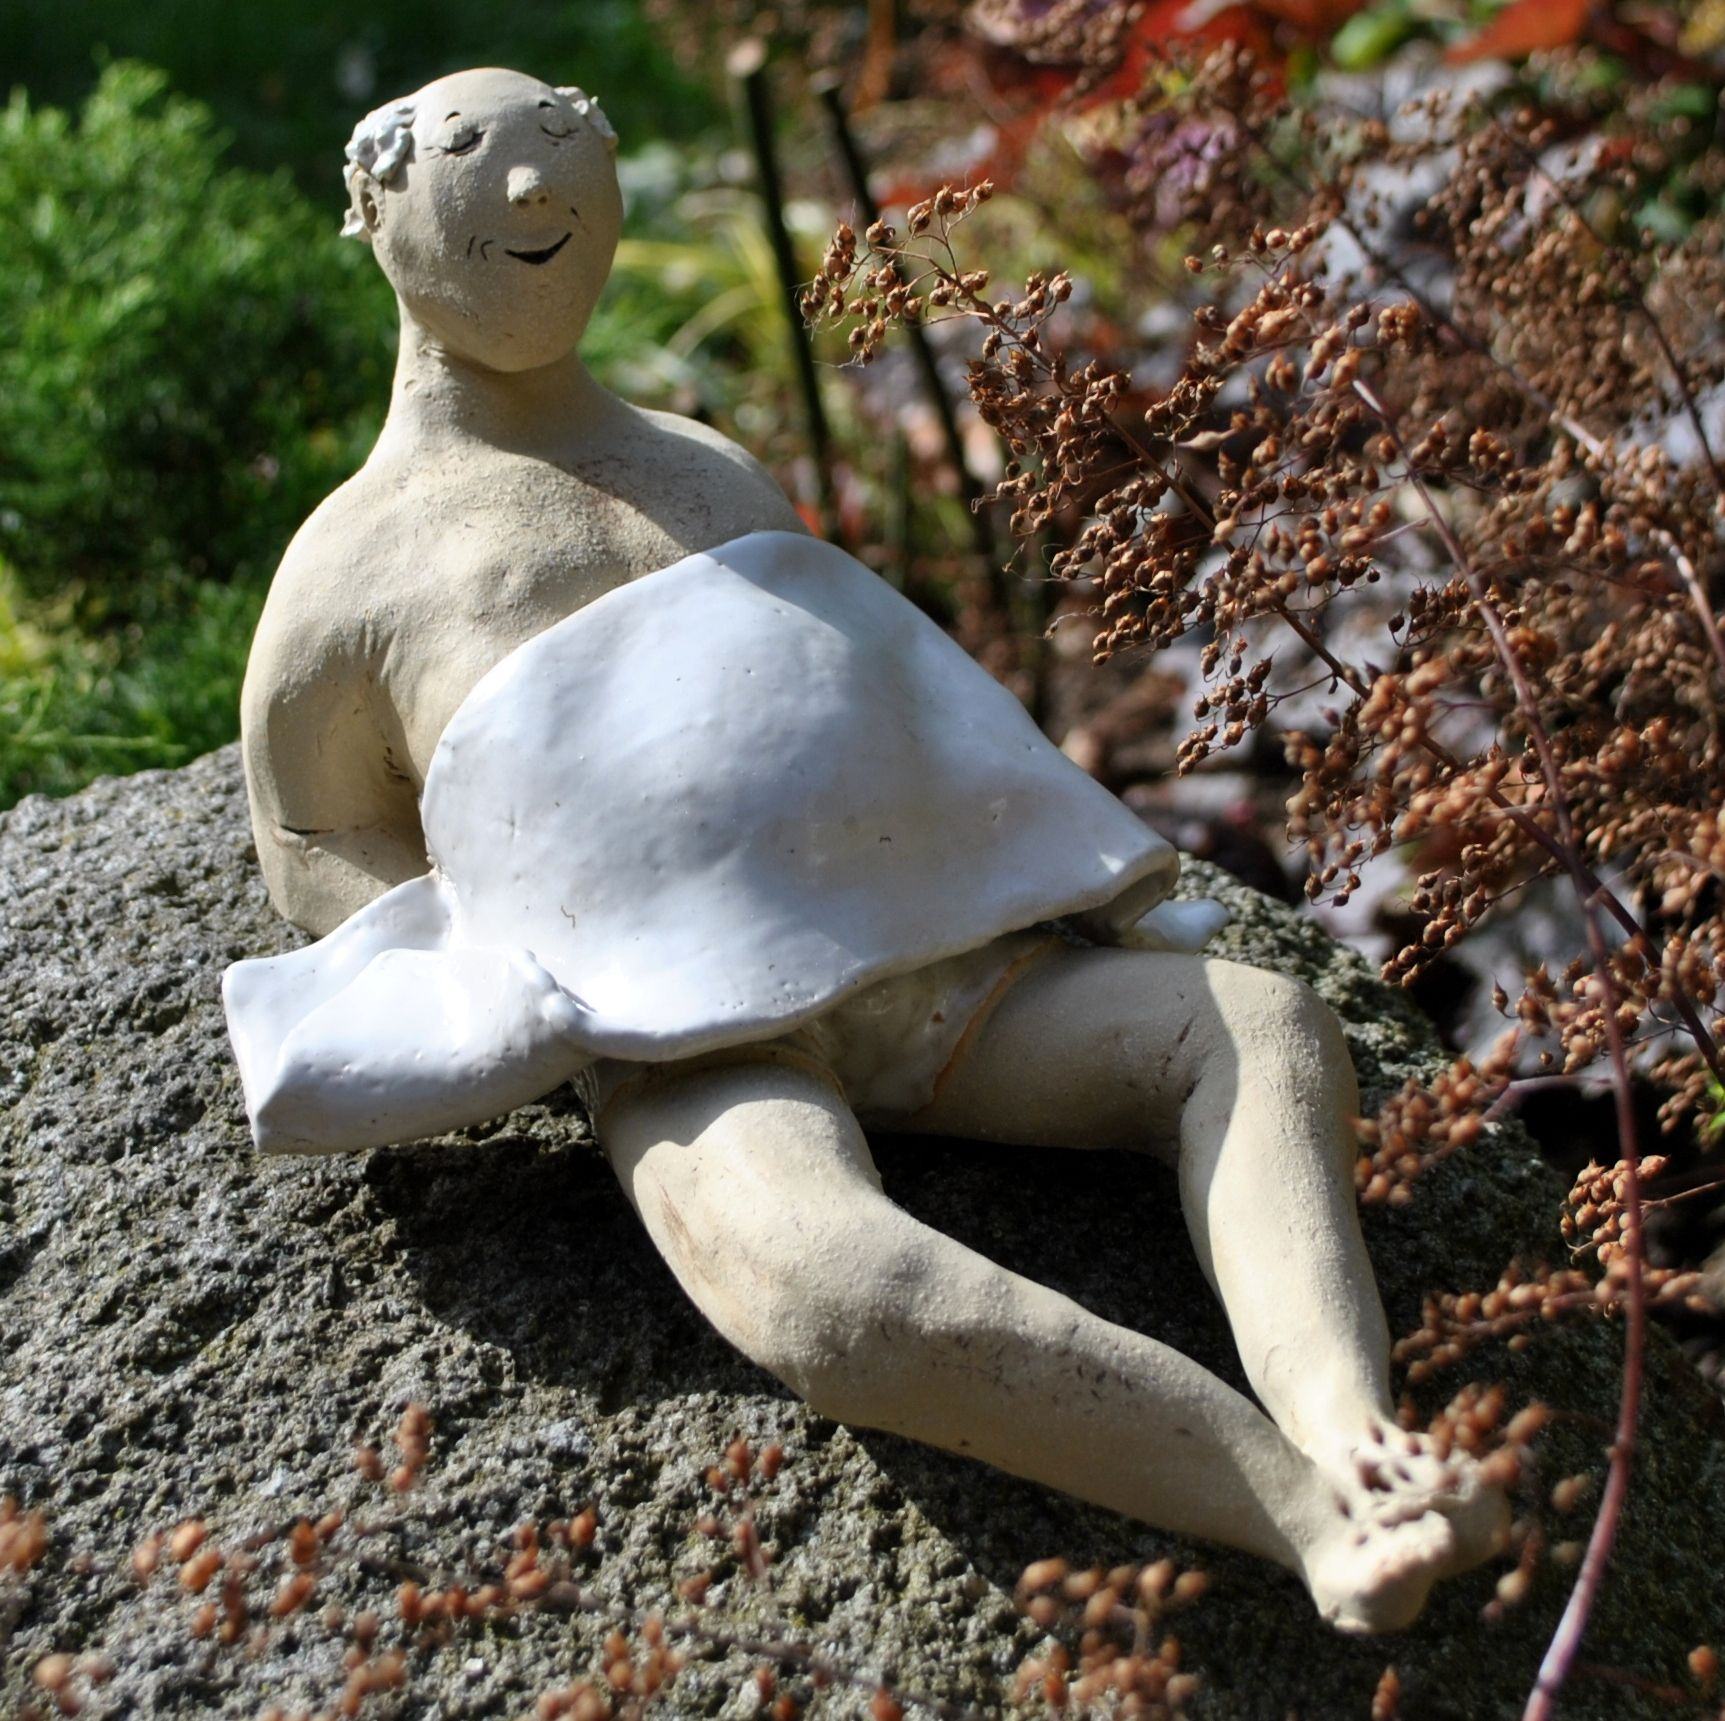 Keramikfigur Handmade Sonnenbad Im Garten Gartenfiguren Gartenskulptur Skulpturen Garten